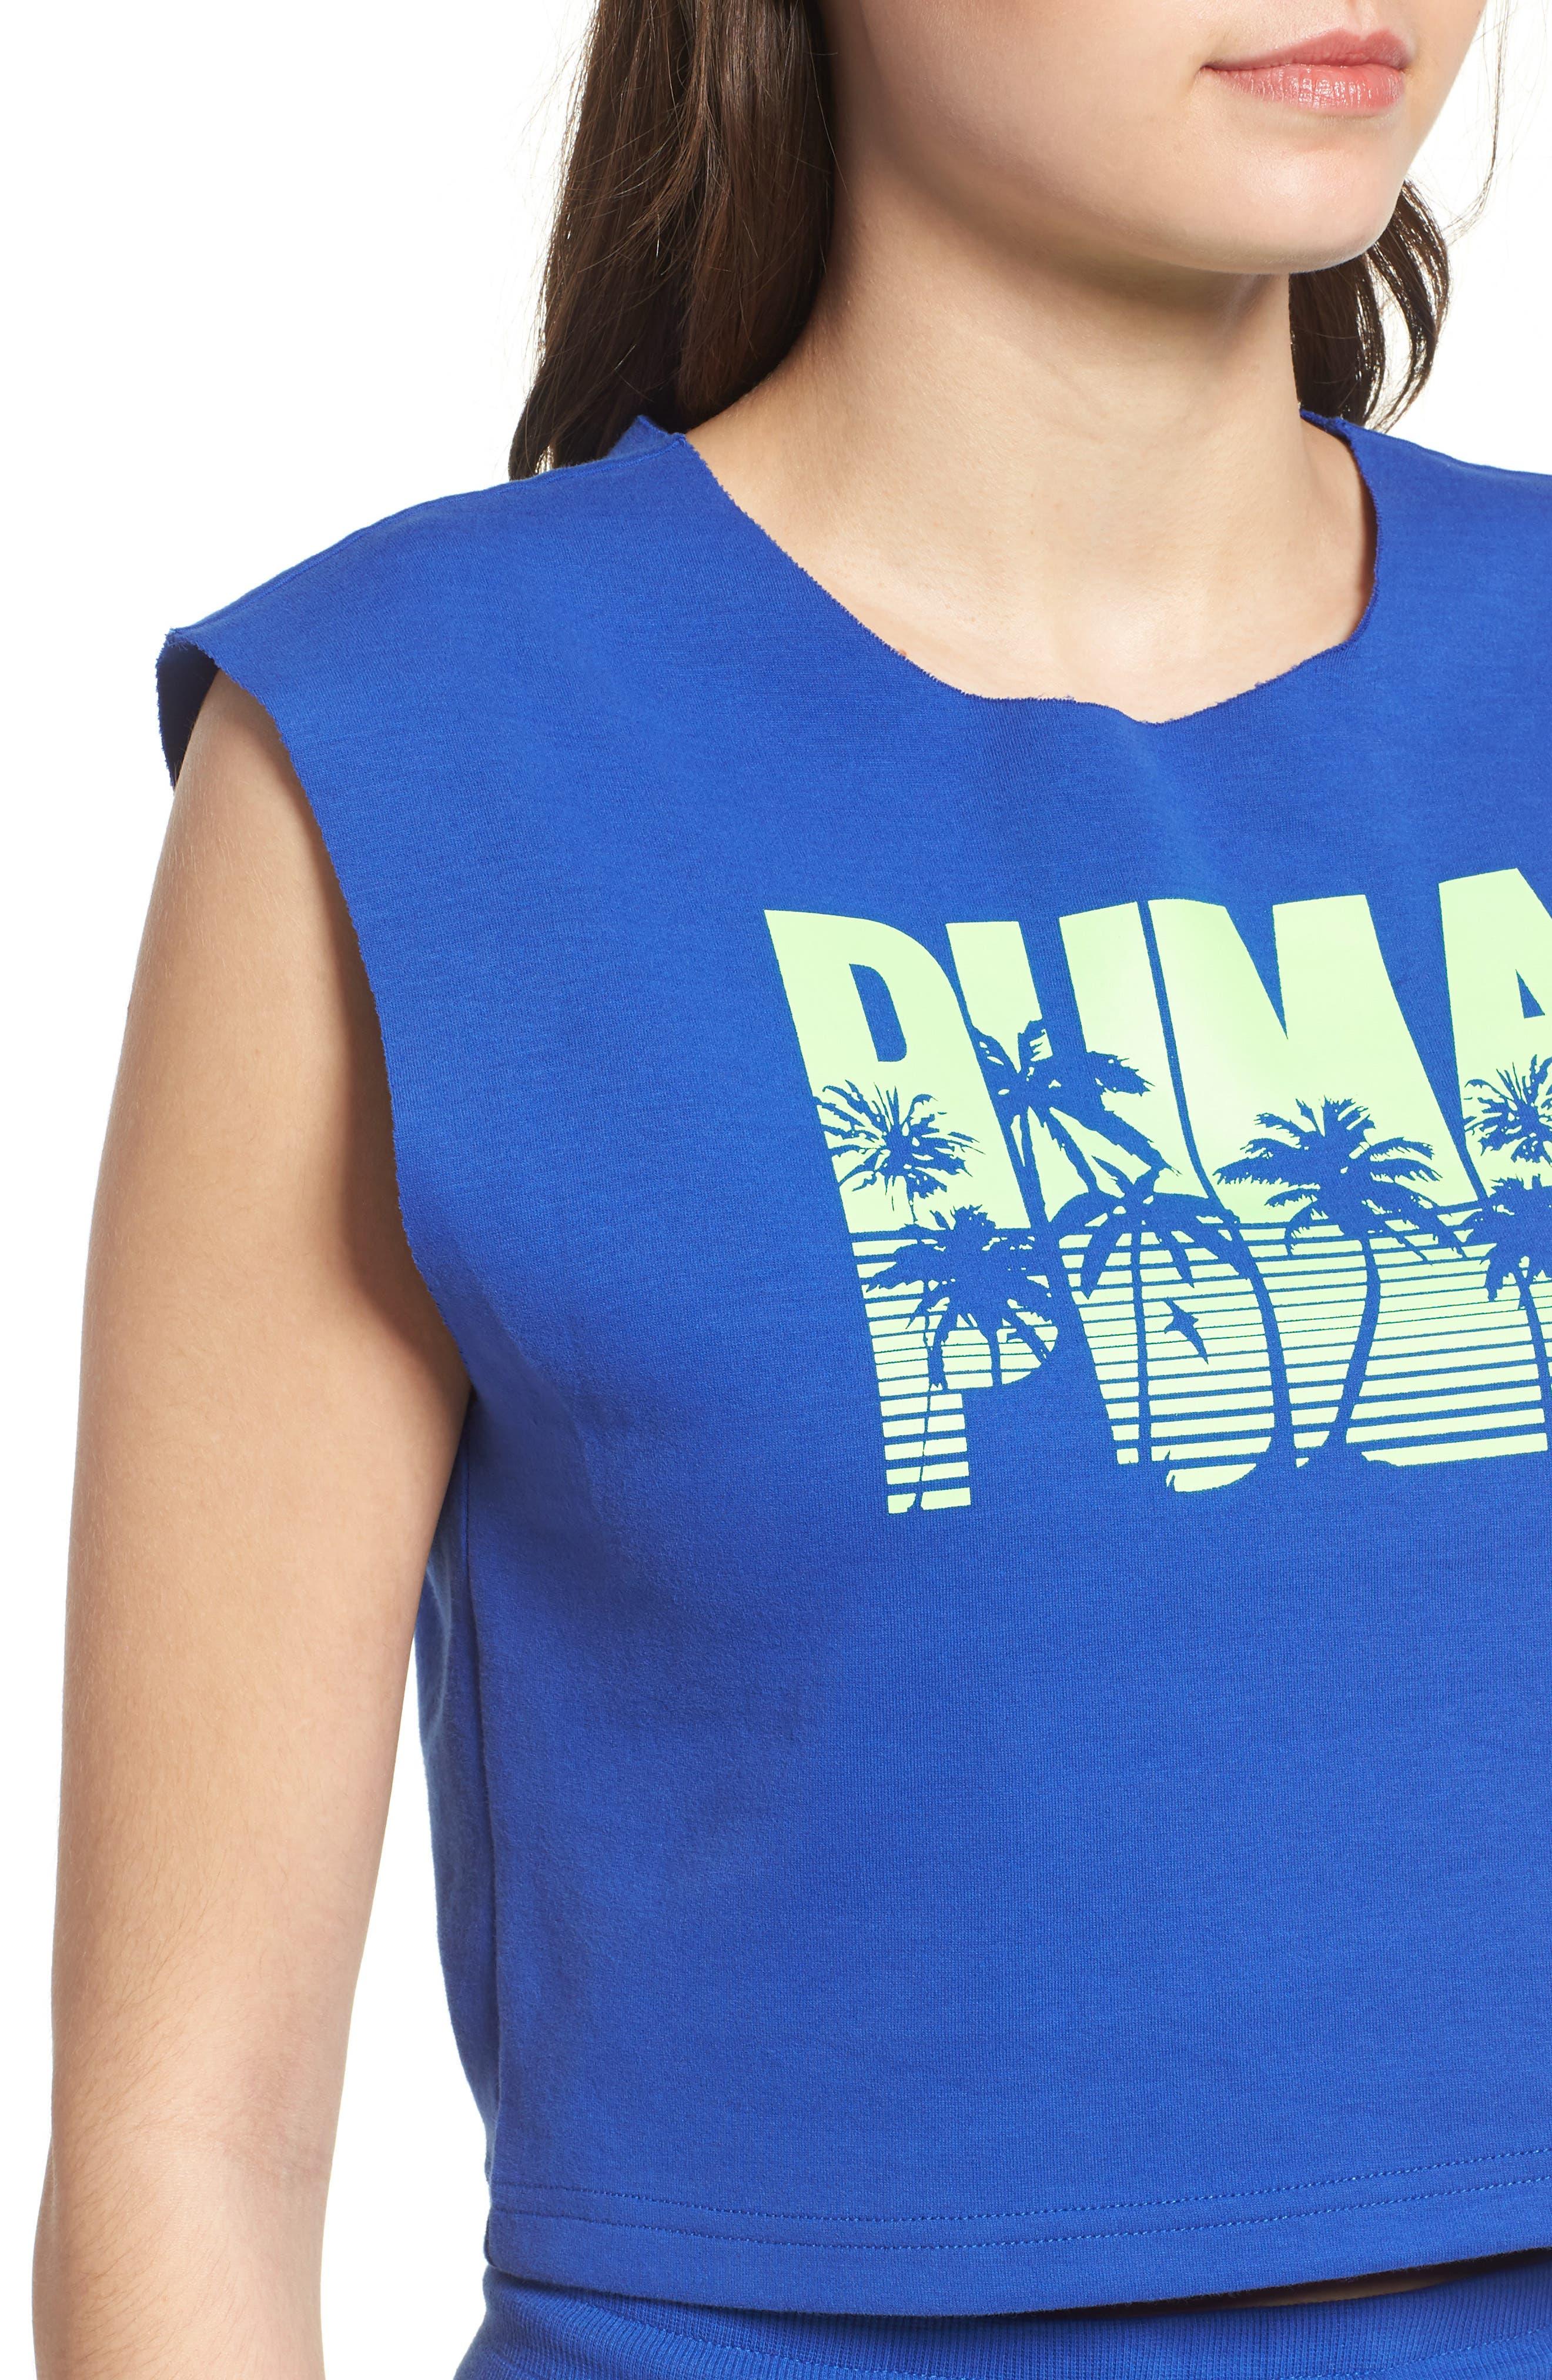 FENTY PUMA by Rihanna Logo Crop Top,                             Alternate thumbnail 4, color,                             Dazzling Blue